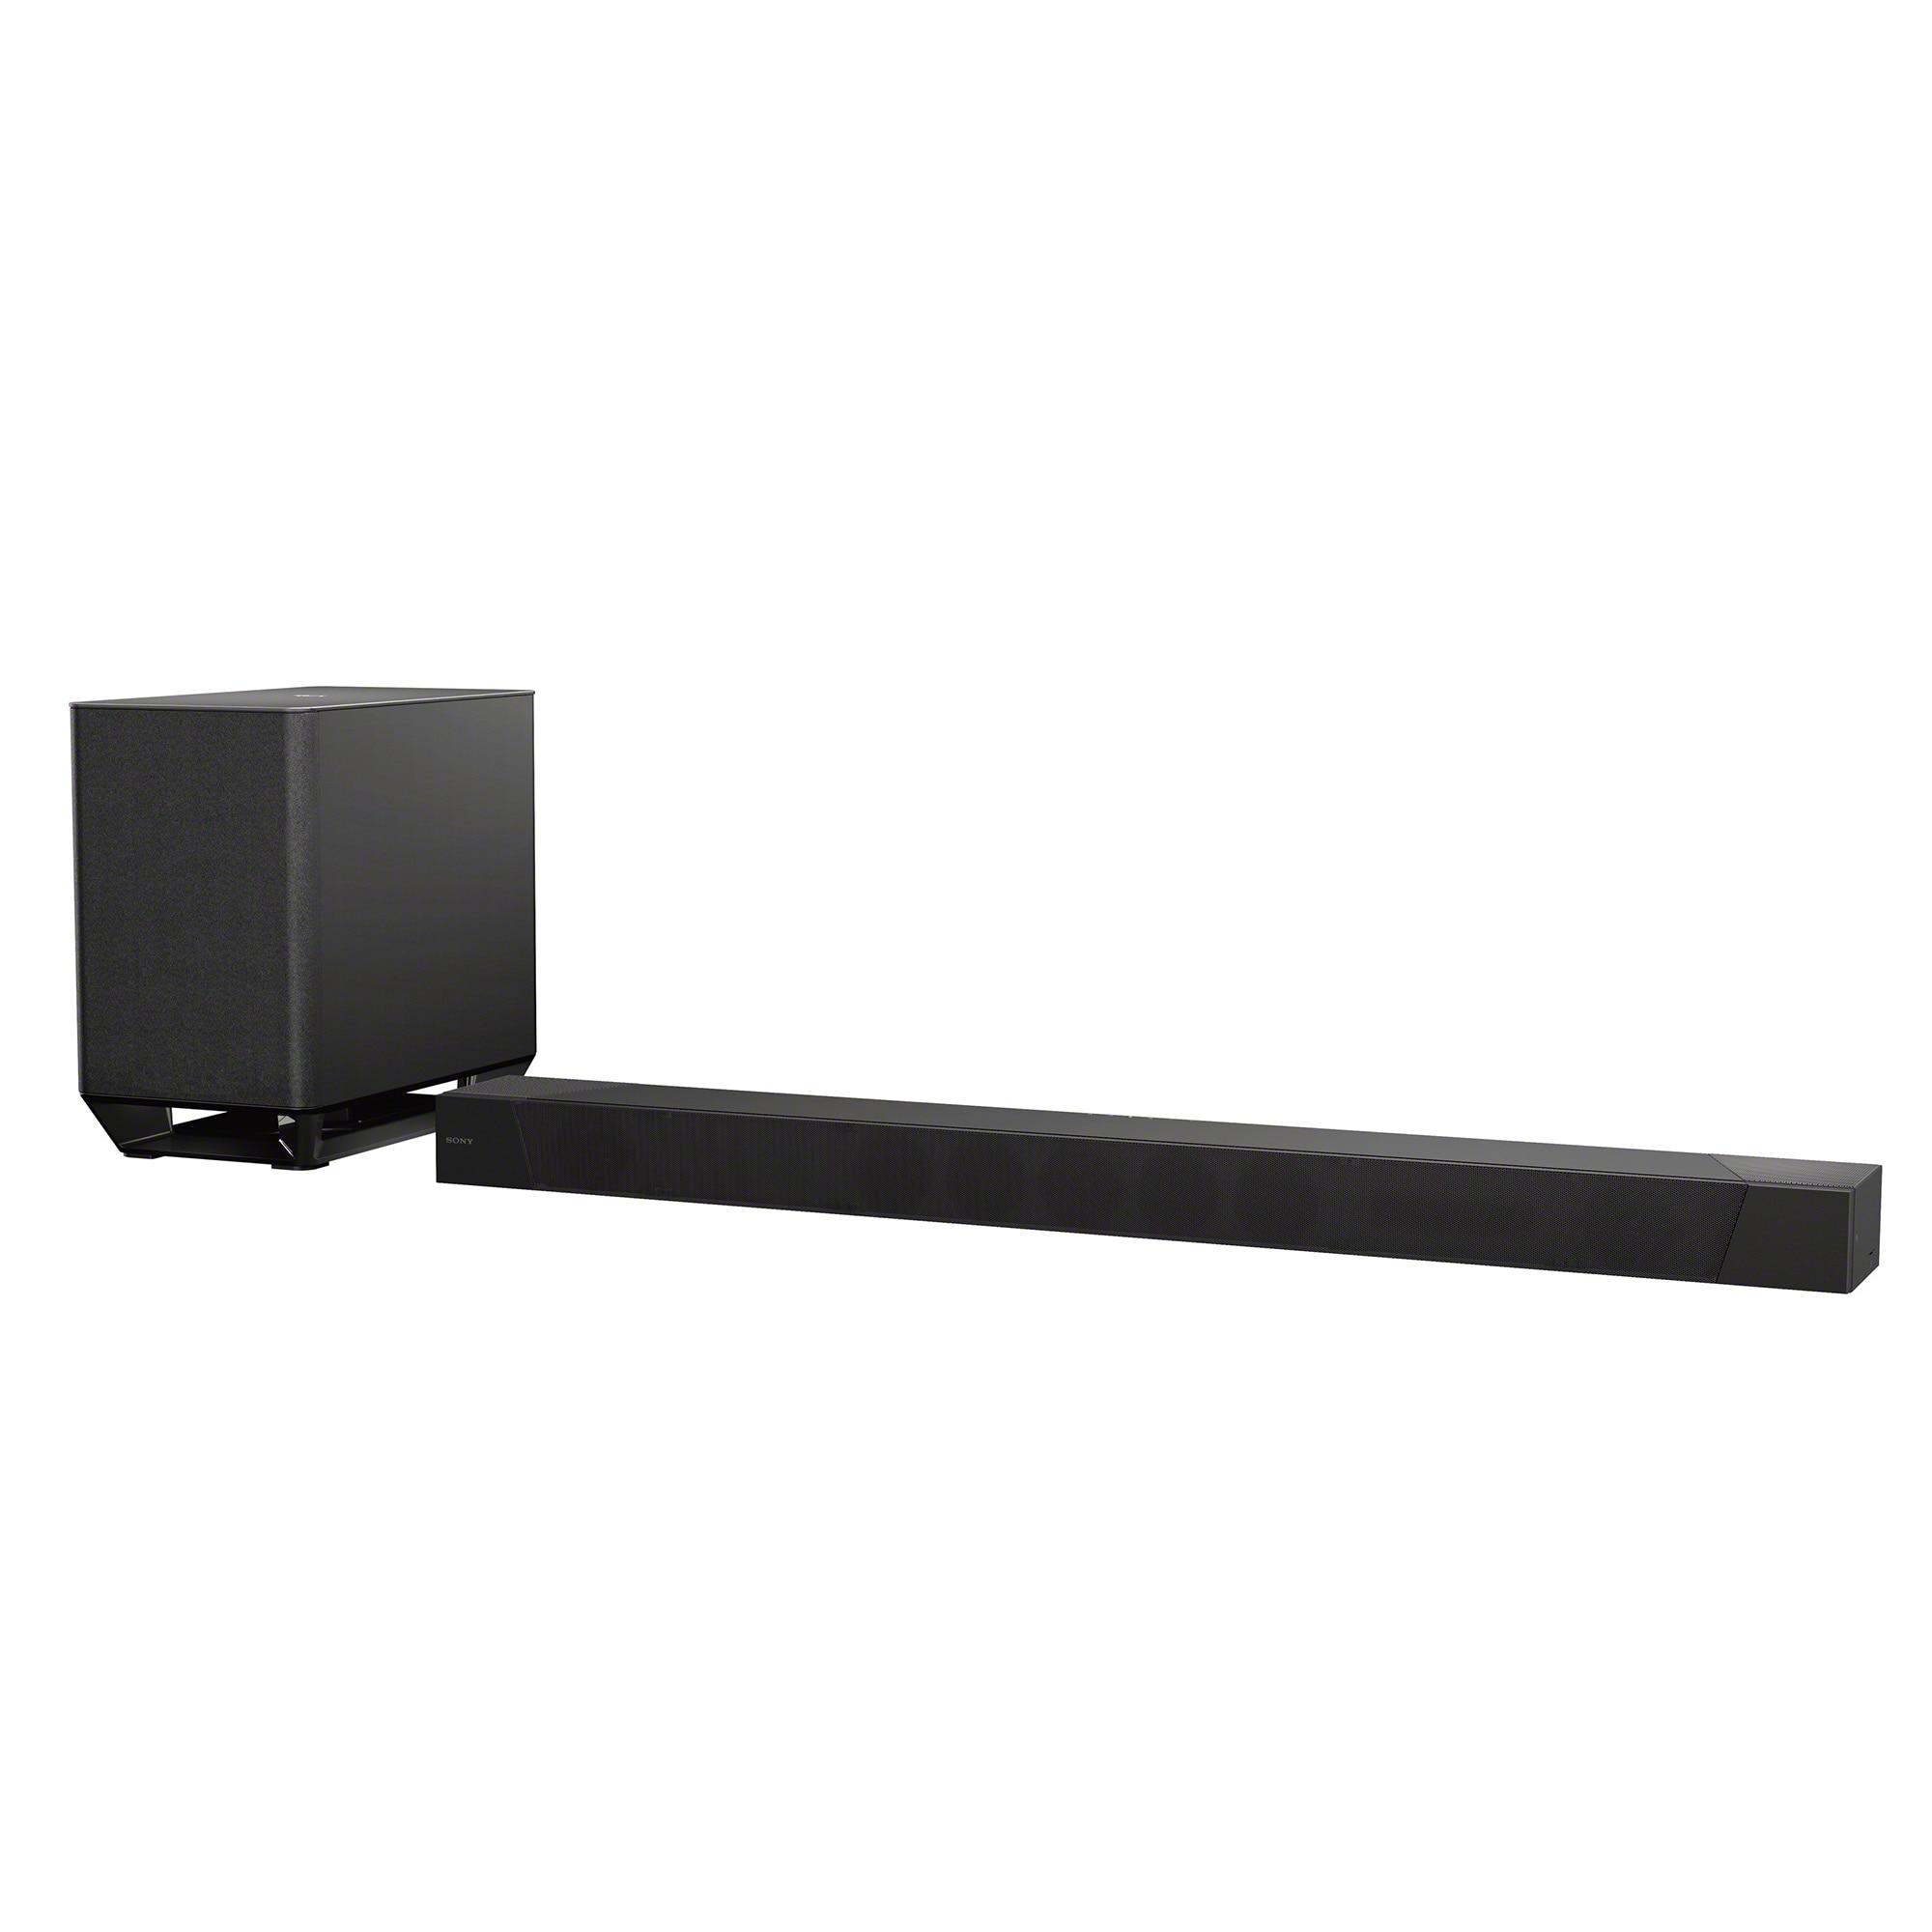 Fotografie Soundbar Sony HT-ST5000, Dolby Atmos, Hi-Res, 7.1.2 canale, Wi-Fi, Bluetooth, Negru